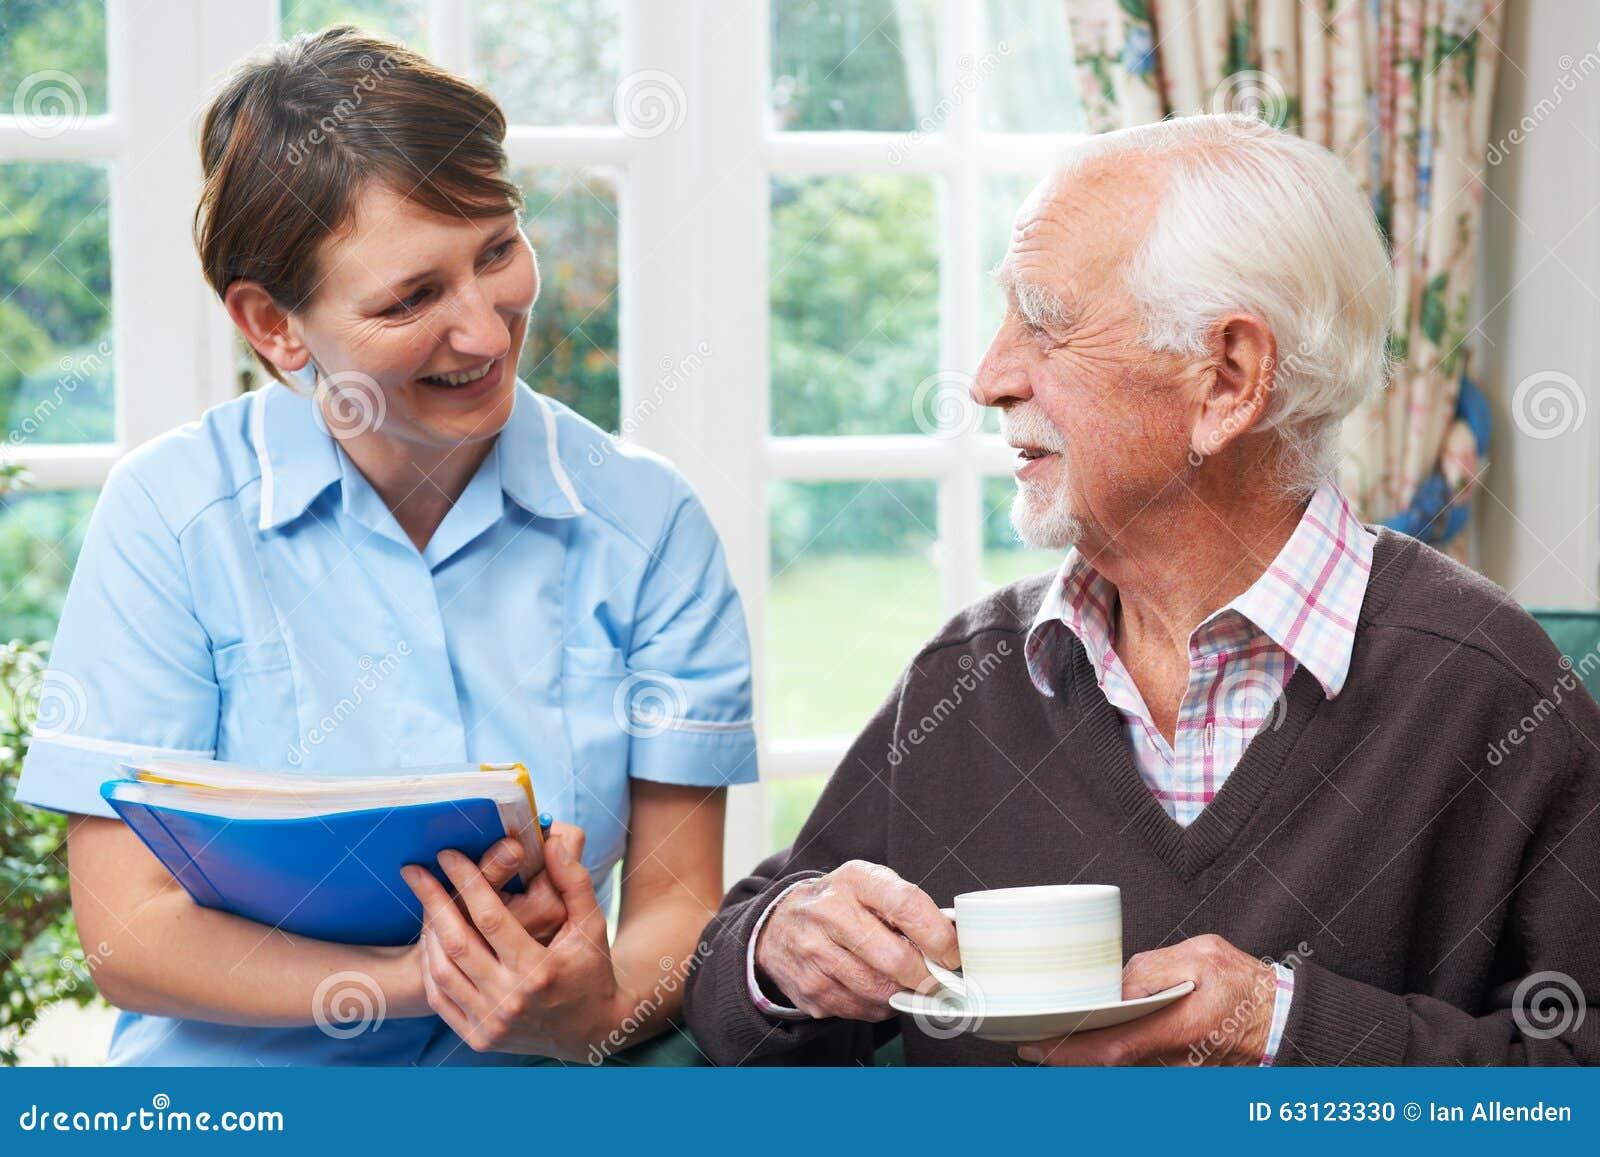 Uomo senior con il personale sanitario a casa